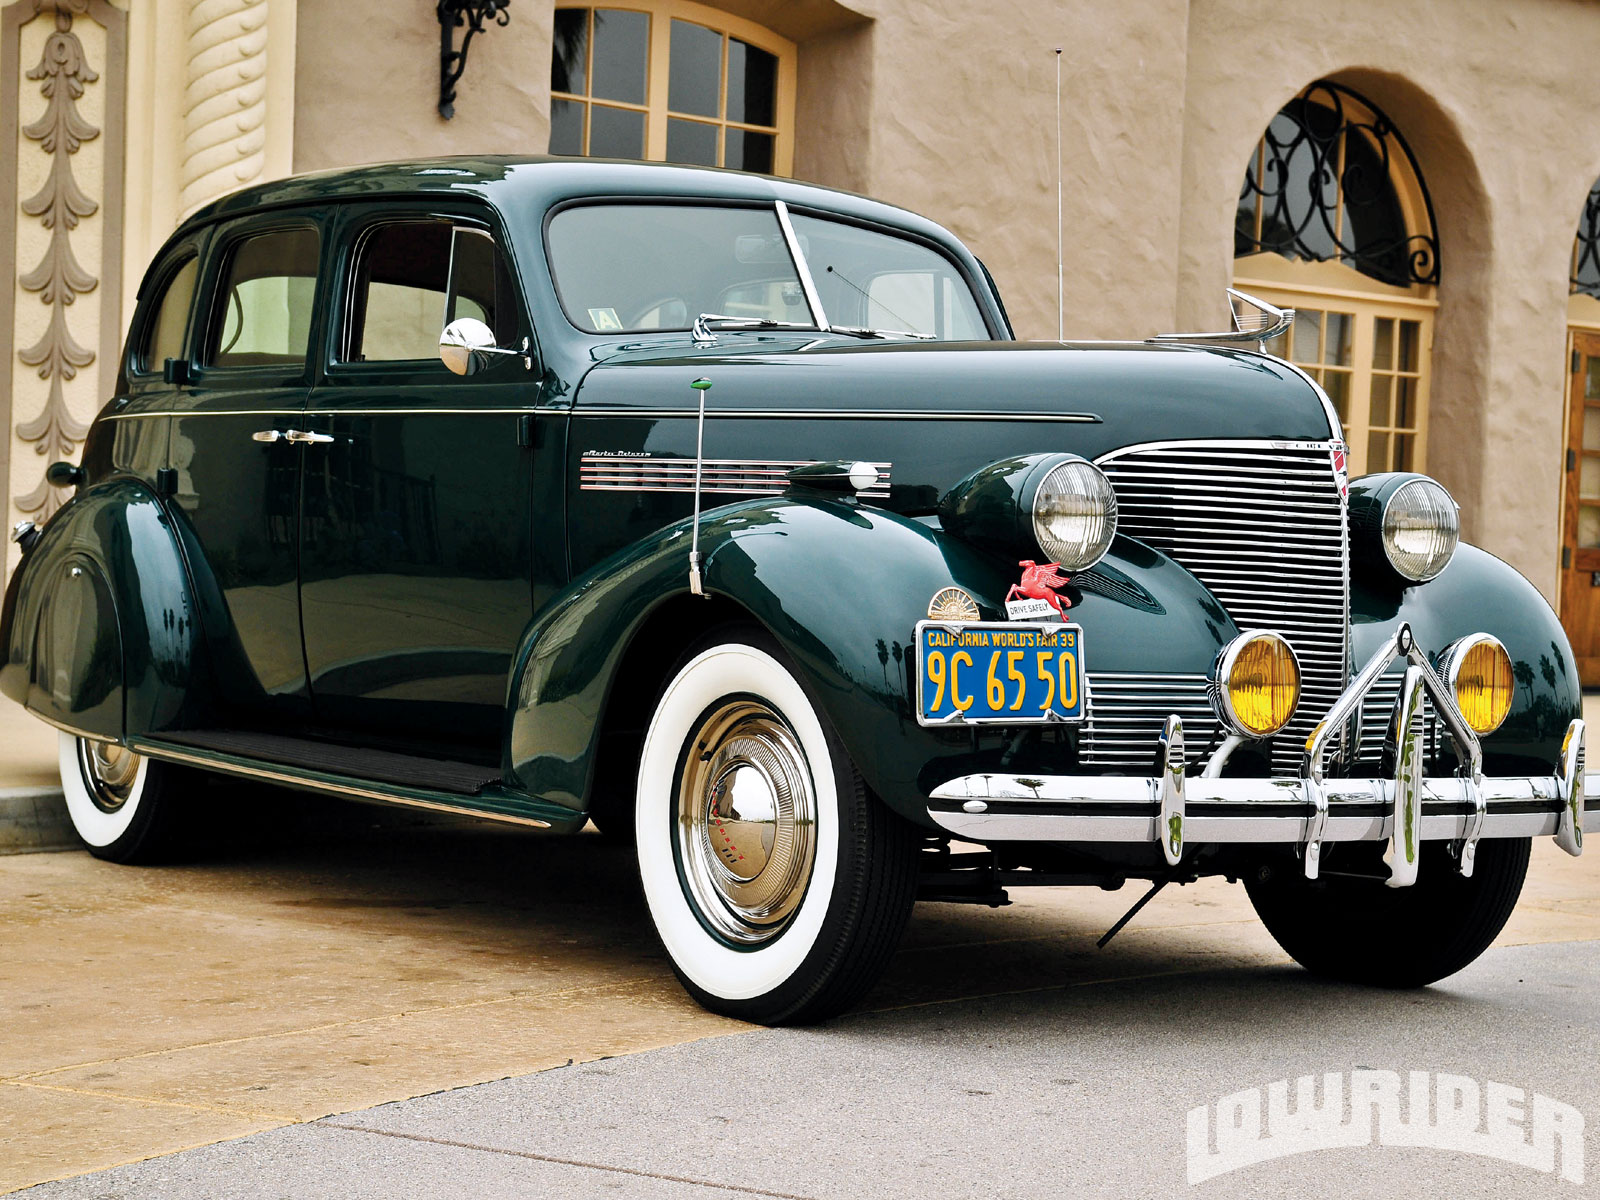 Chevy Truck Specs >> 1939 Chevrolet Master Dexlue - Lowrider Magazine